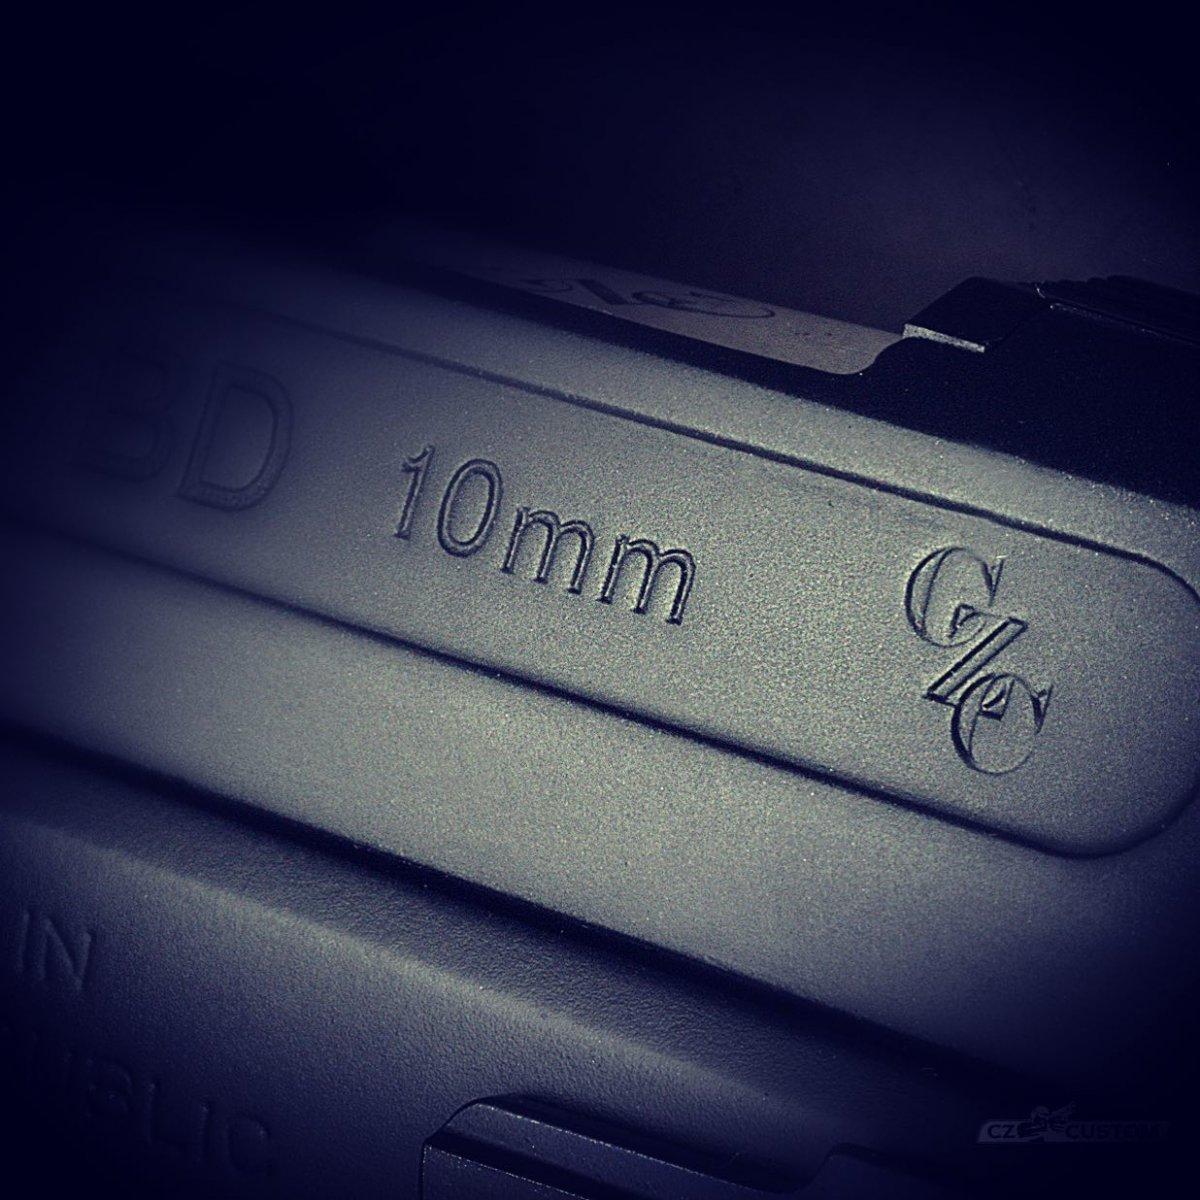 cz10mm.jpg